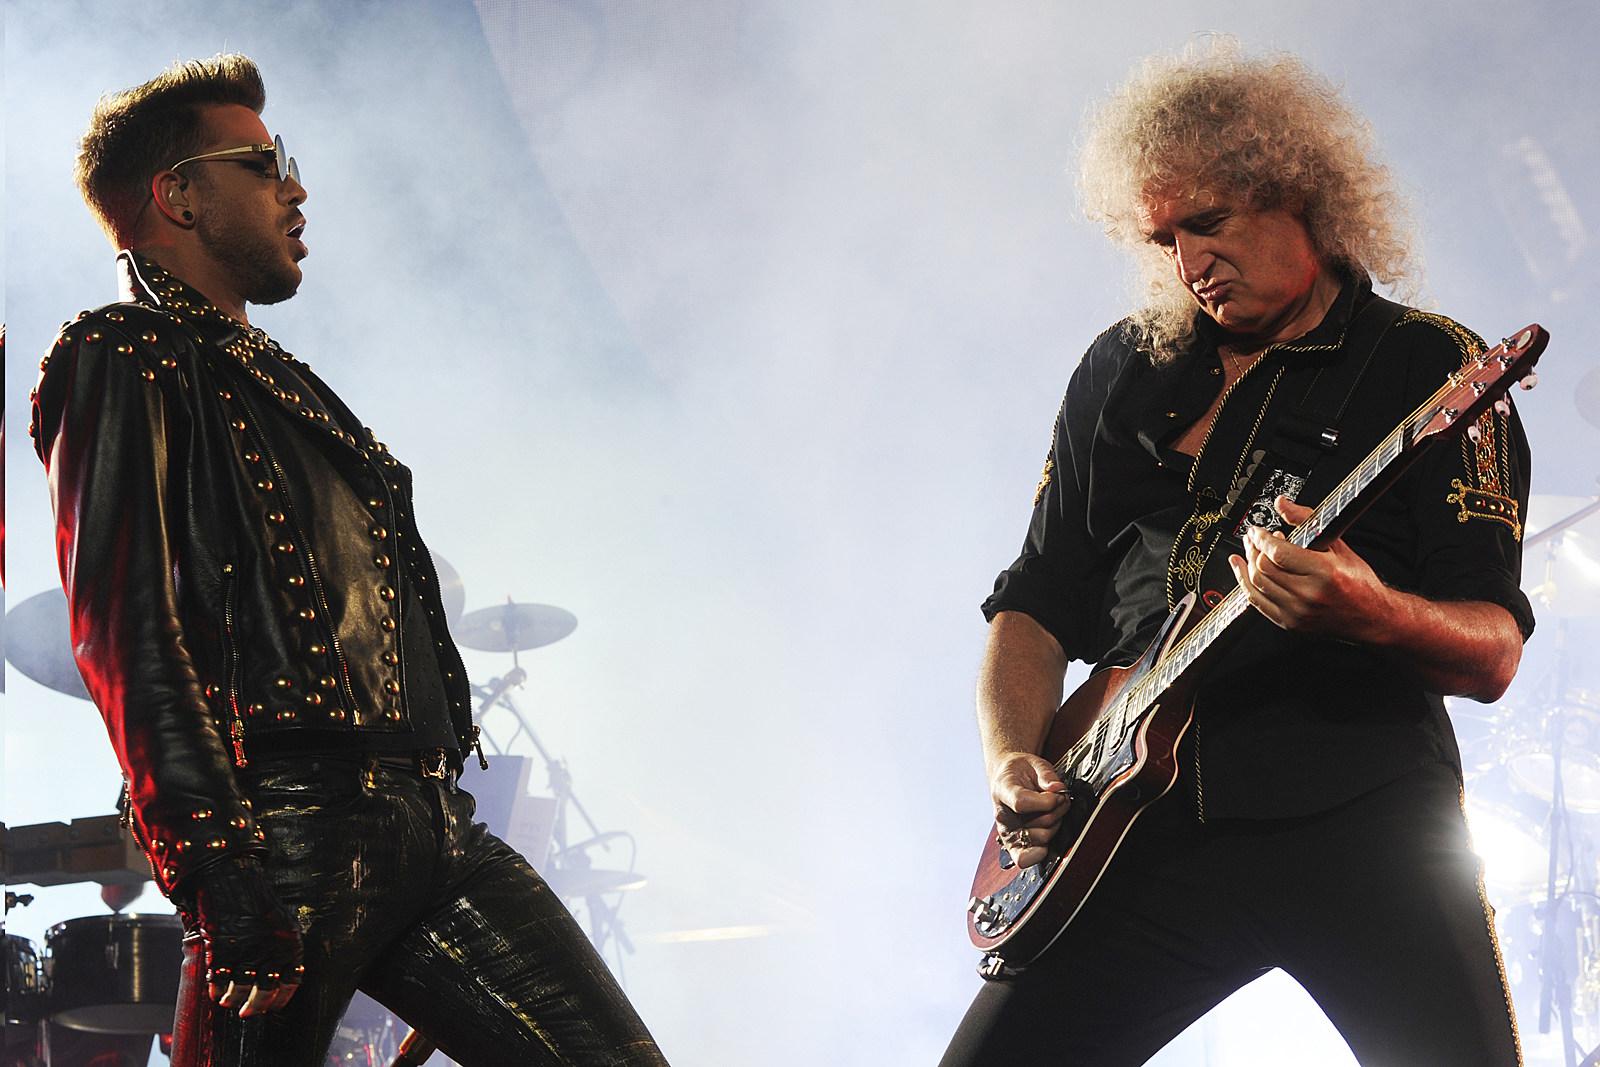 Queen + Adam Lambert Announce 2019 North American 'Rhapsody' Tour